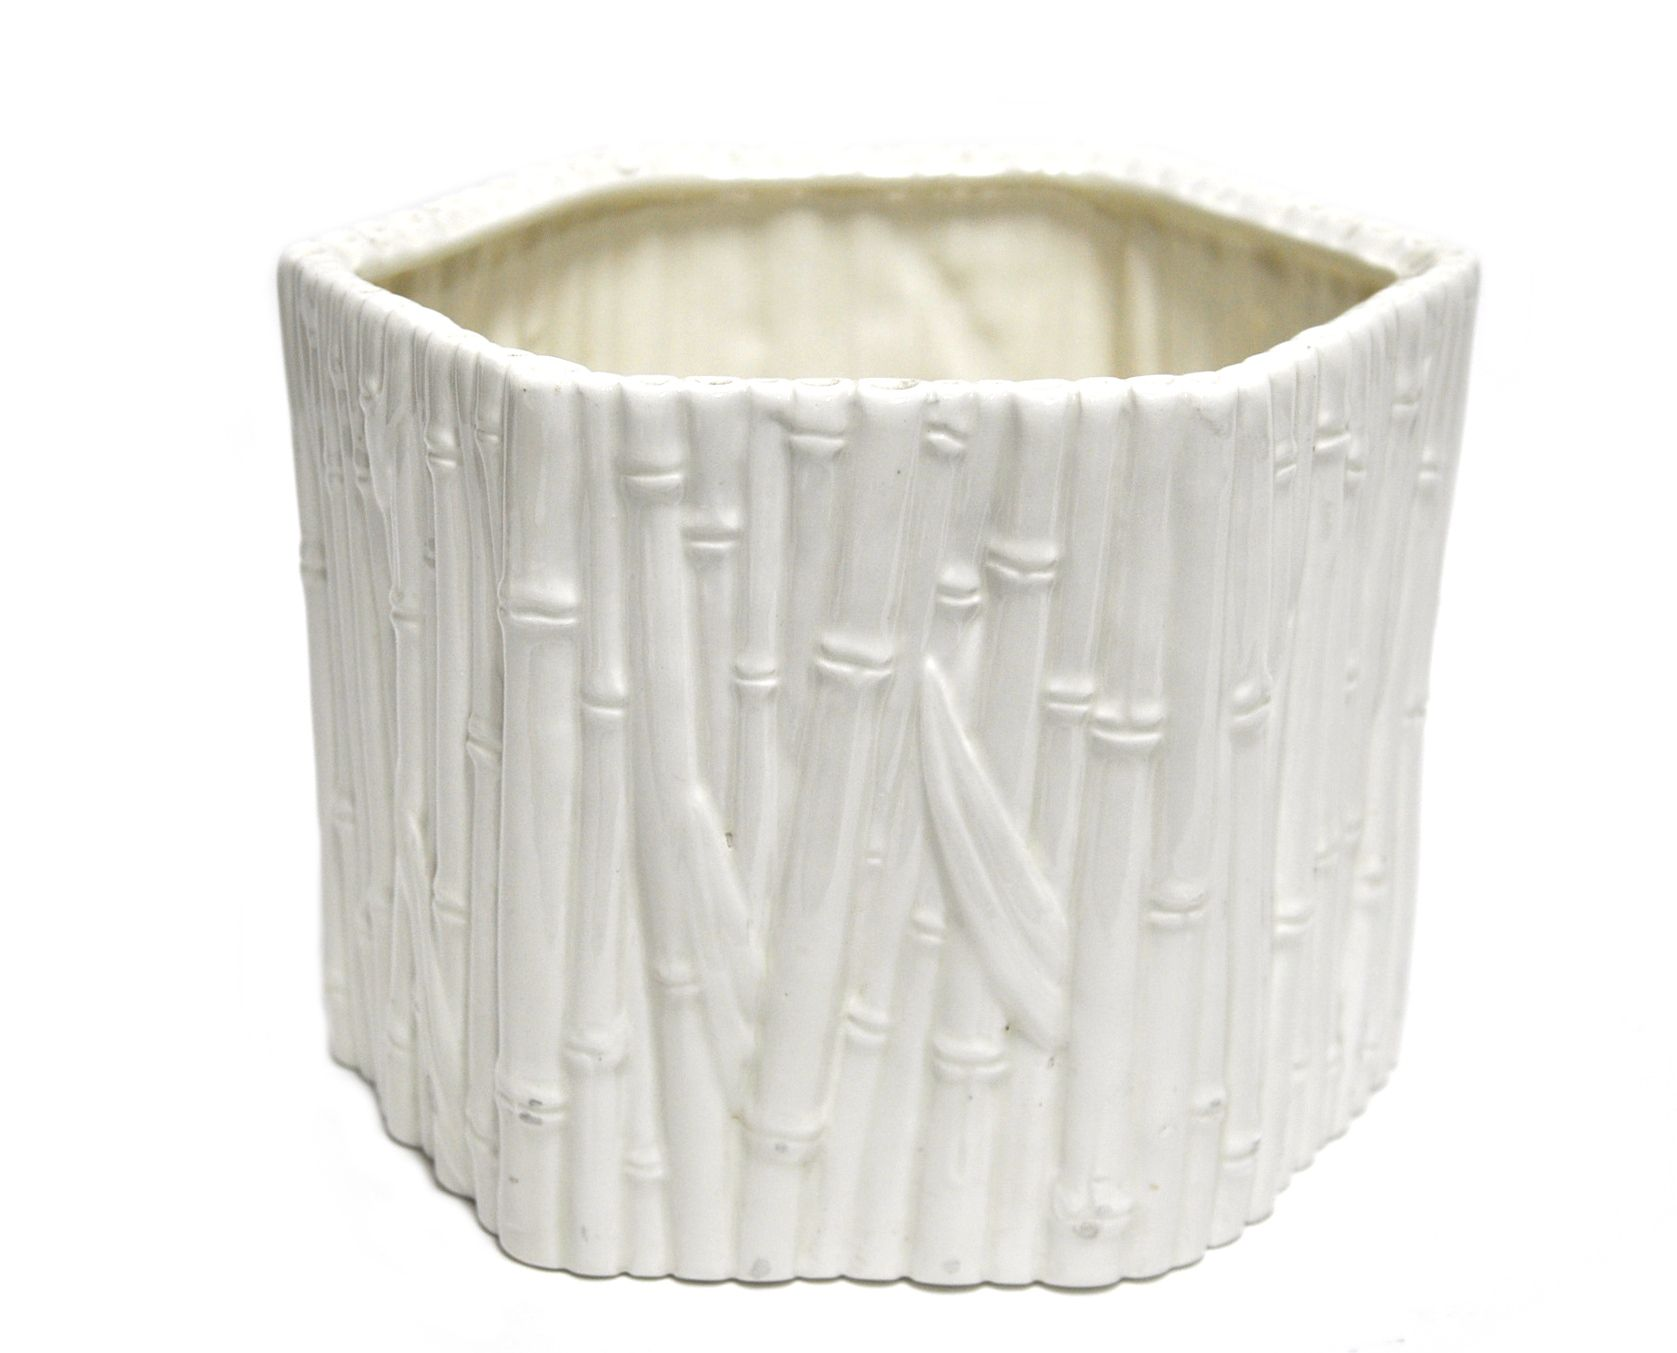 Oversized Vintage Octagonal Ceramic Faux Bamboo Cachepot